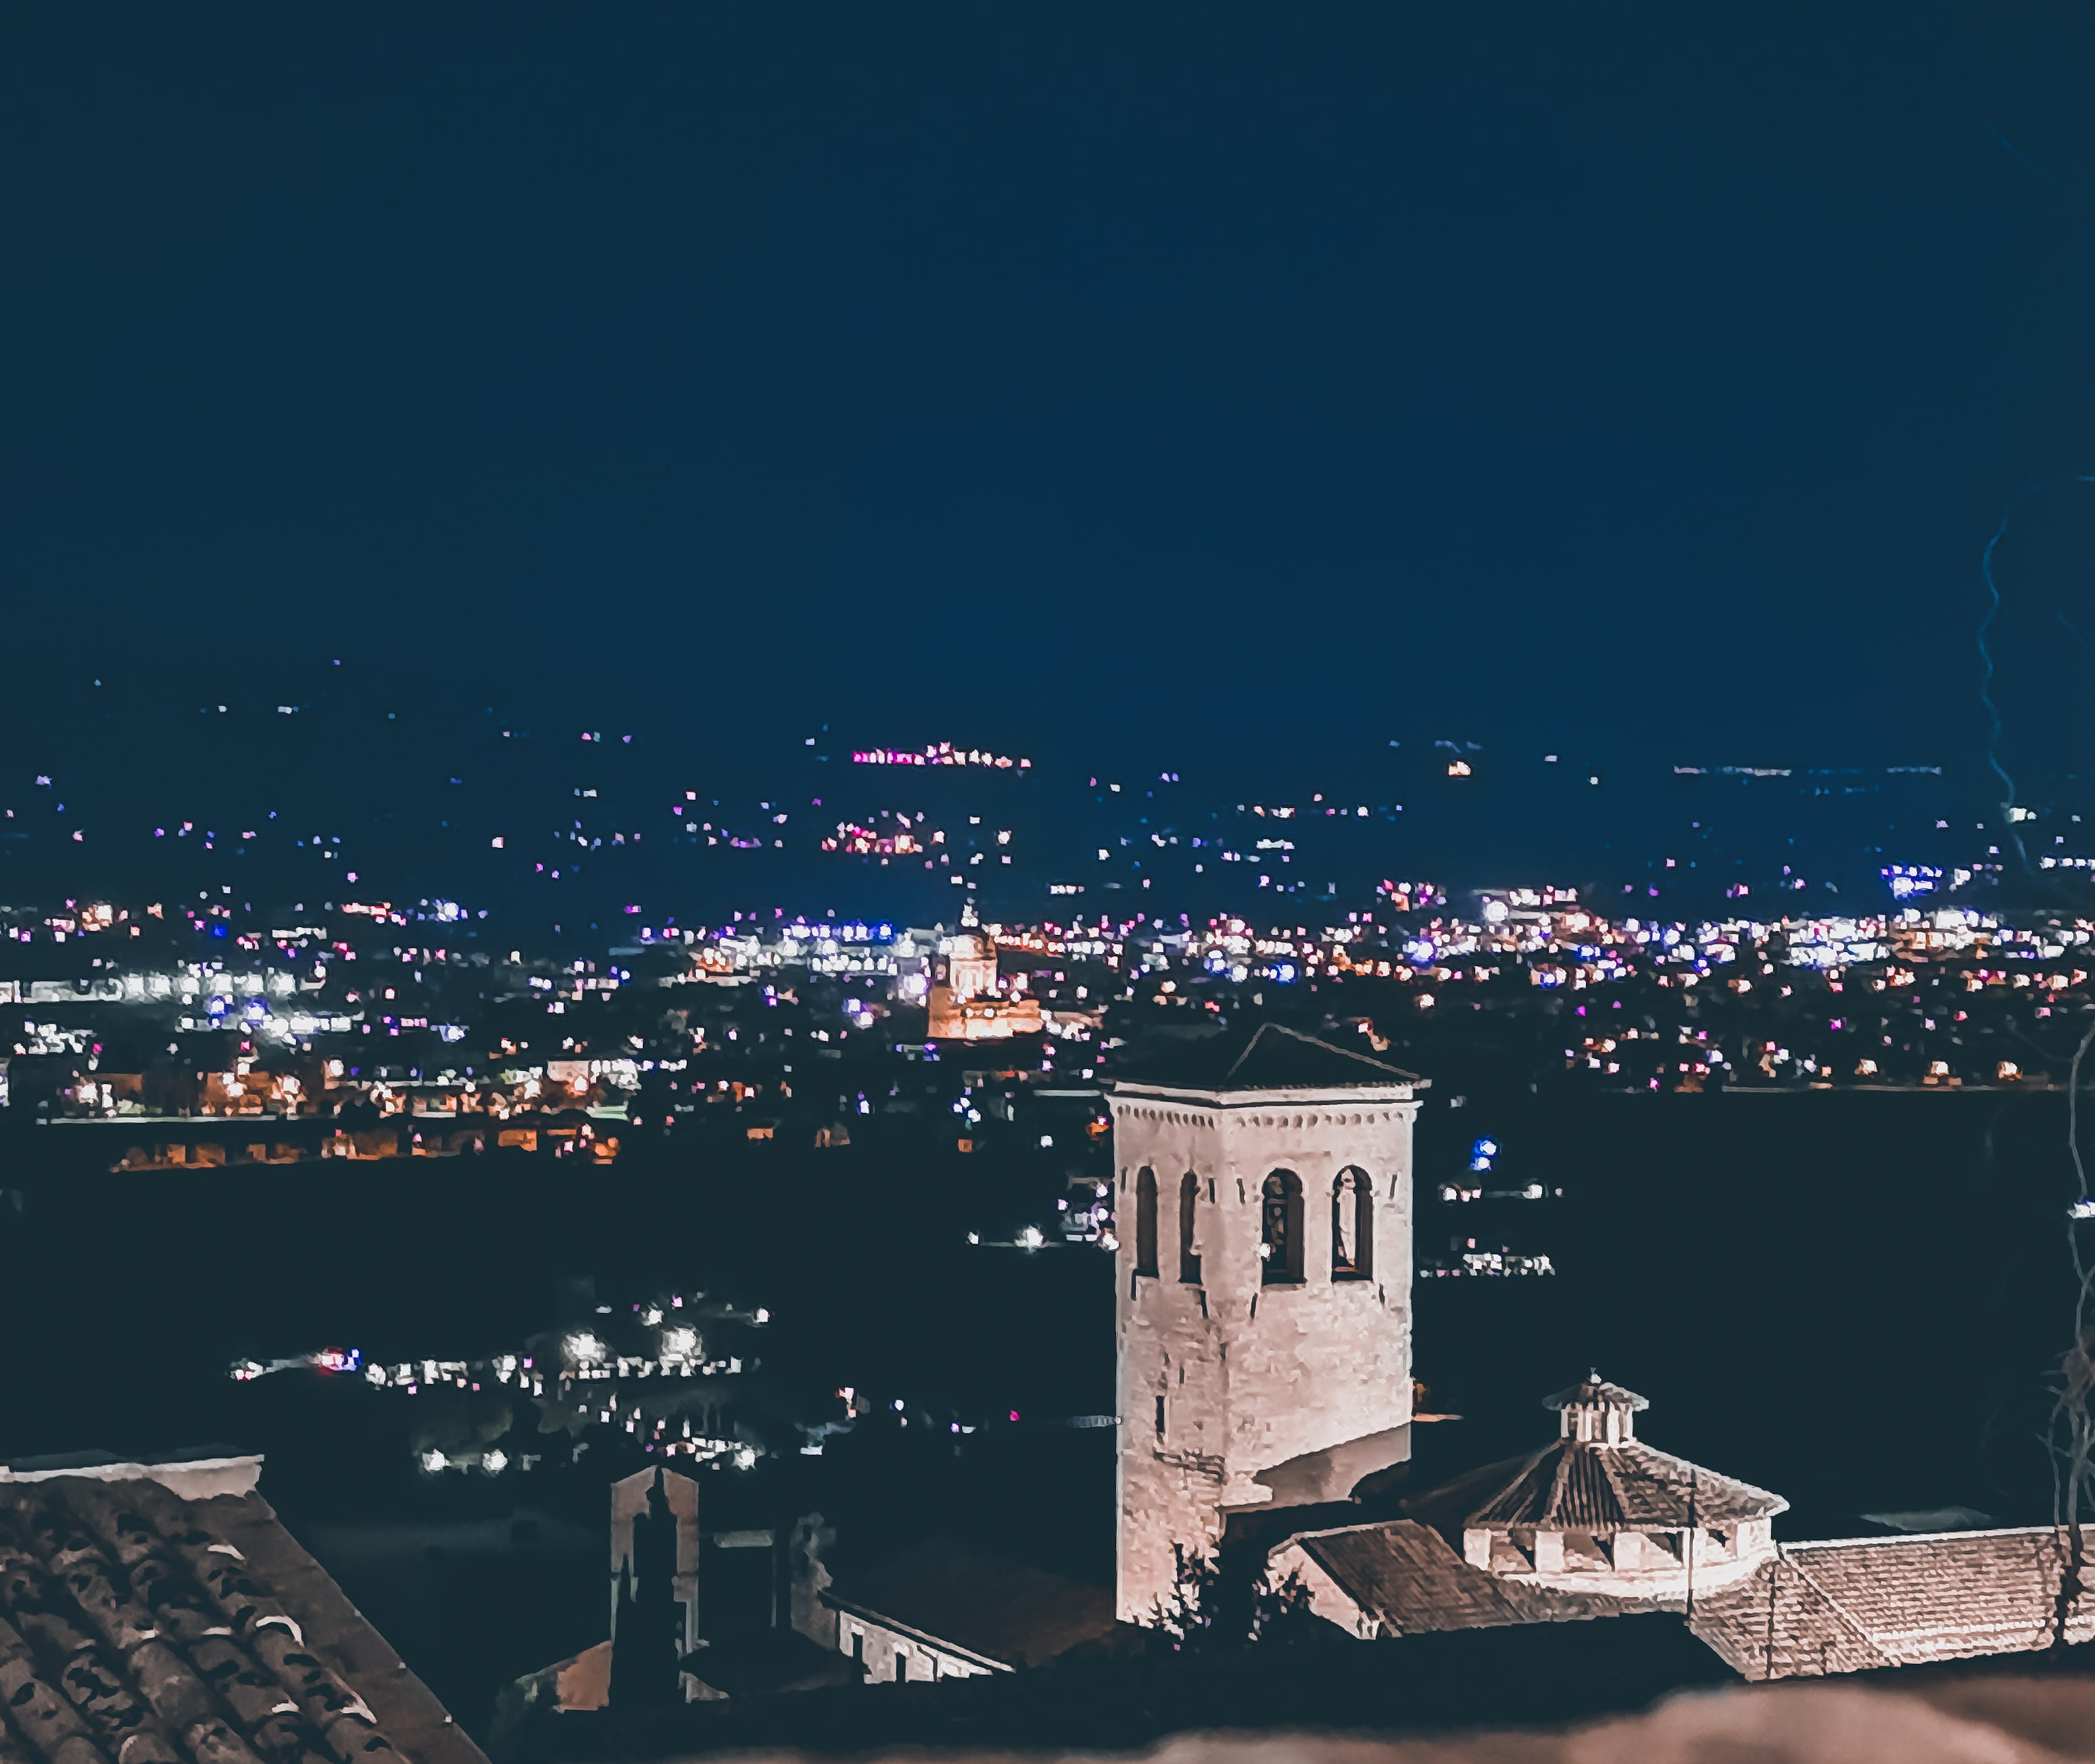 I luoghi più instagrammabili di Assisi